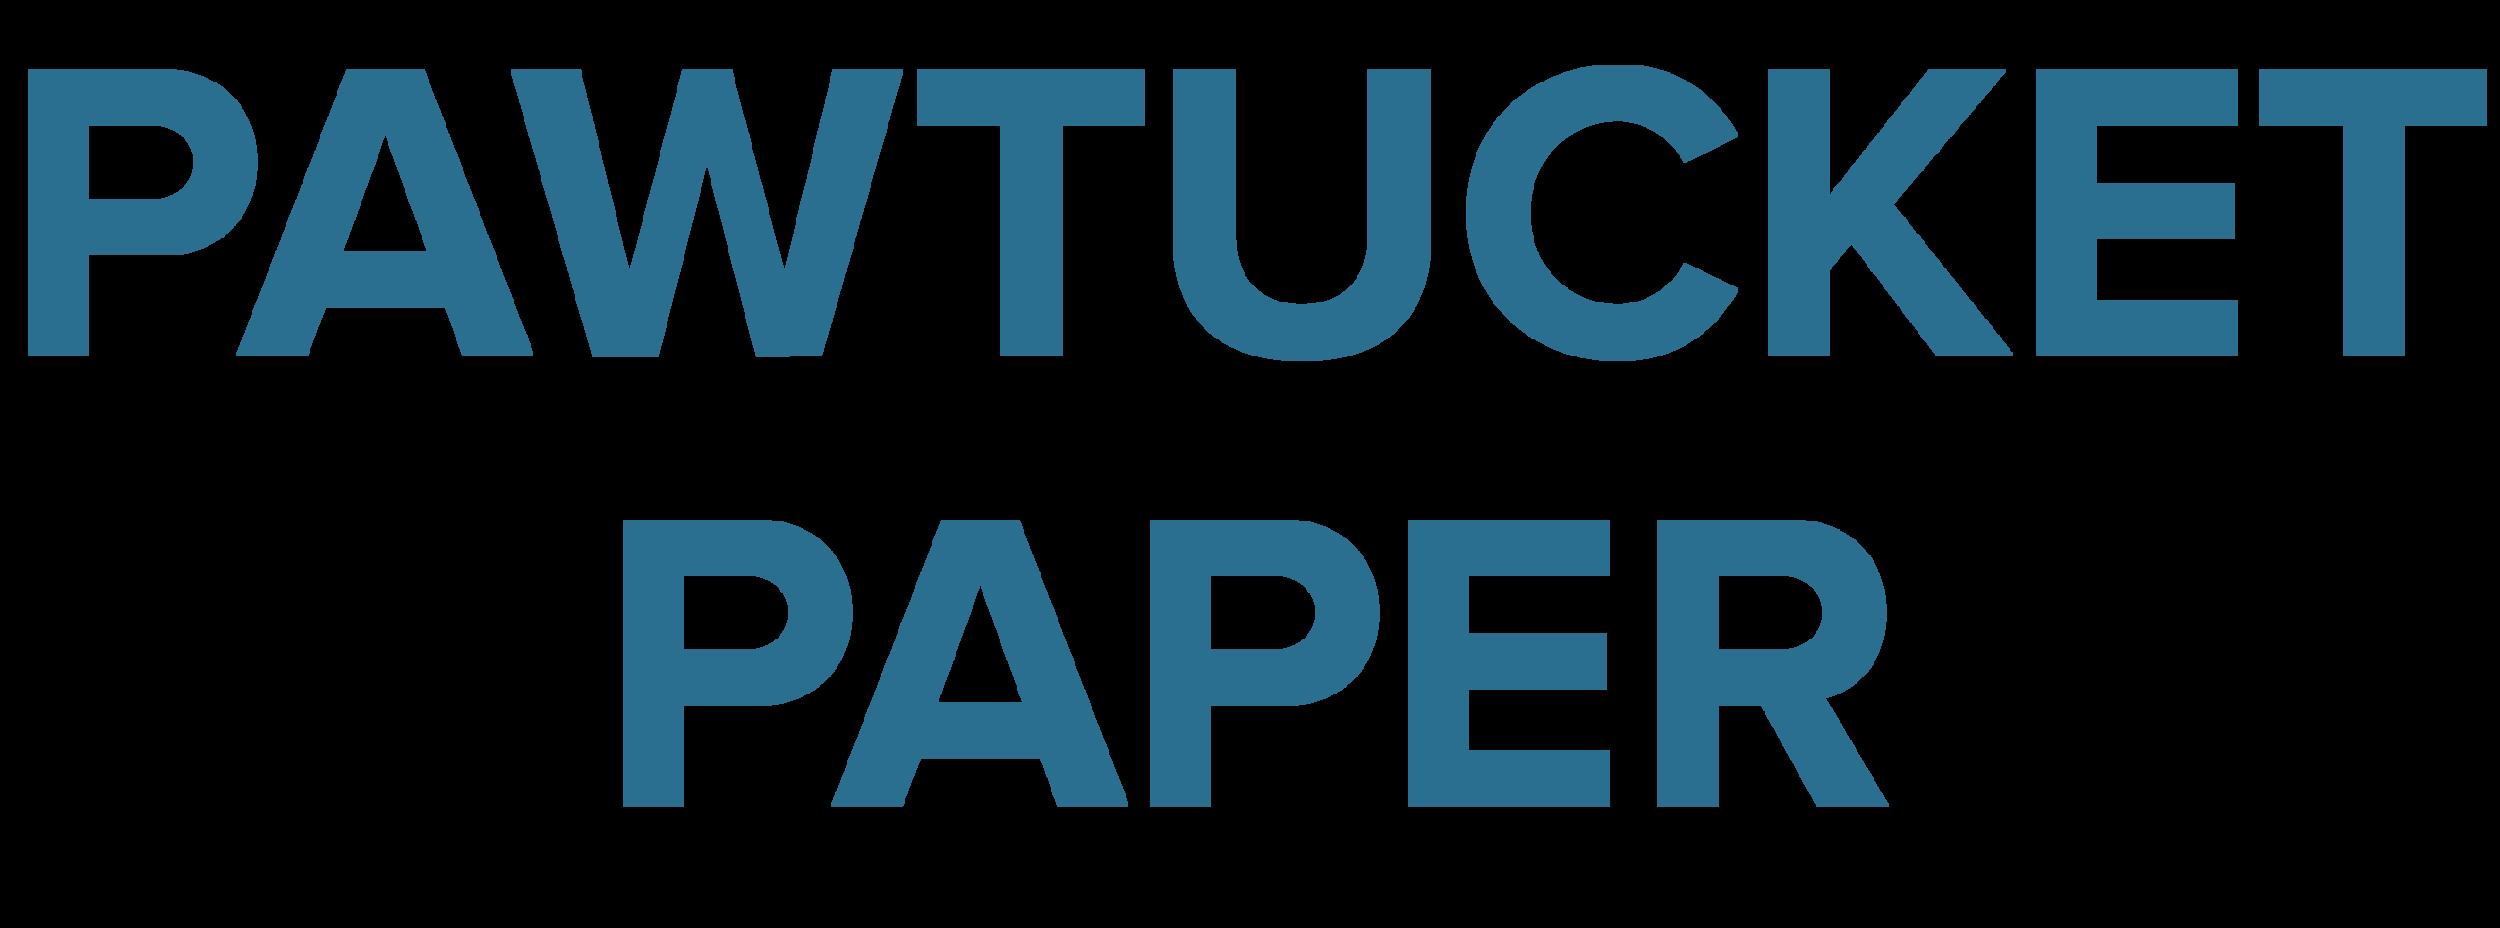 logo-pawtucketpaper-transparent.png